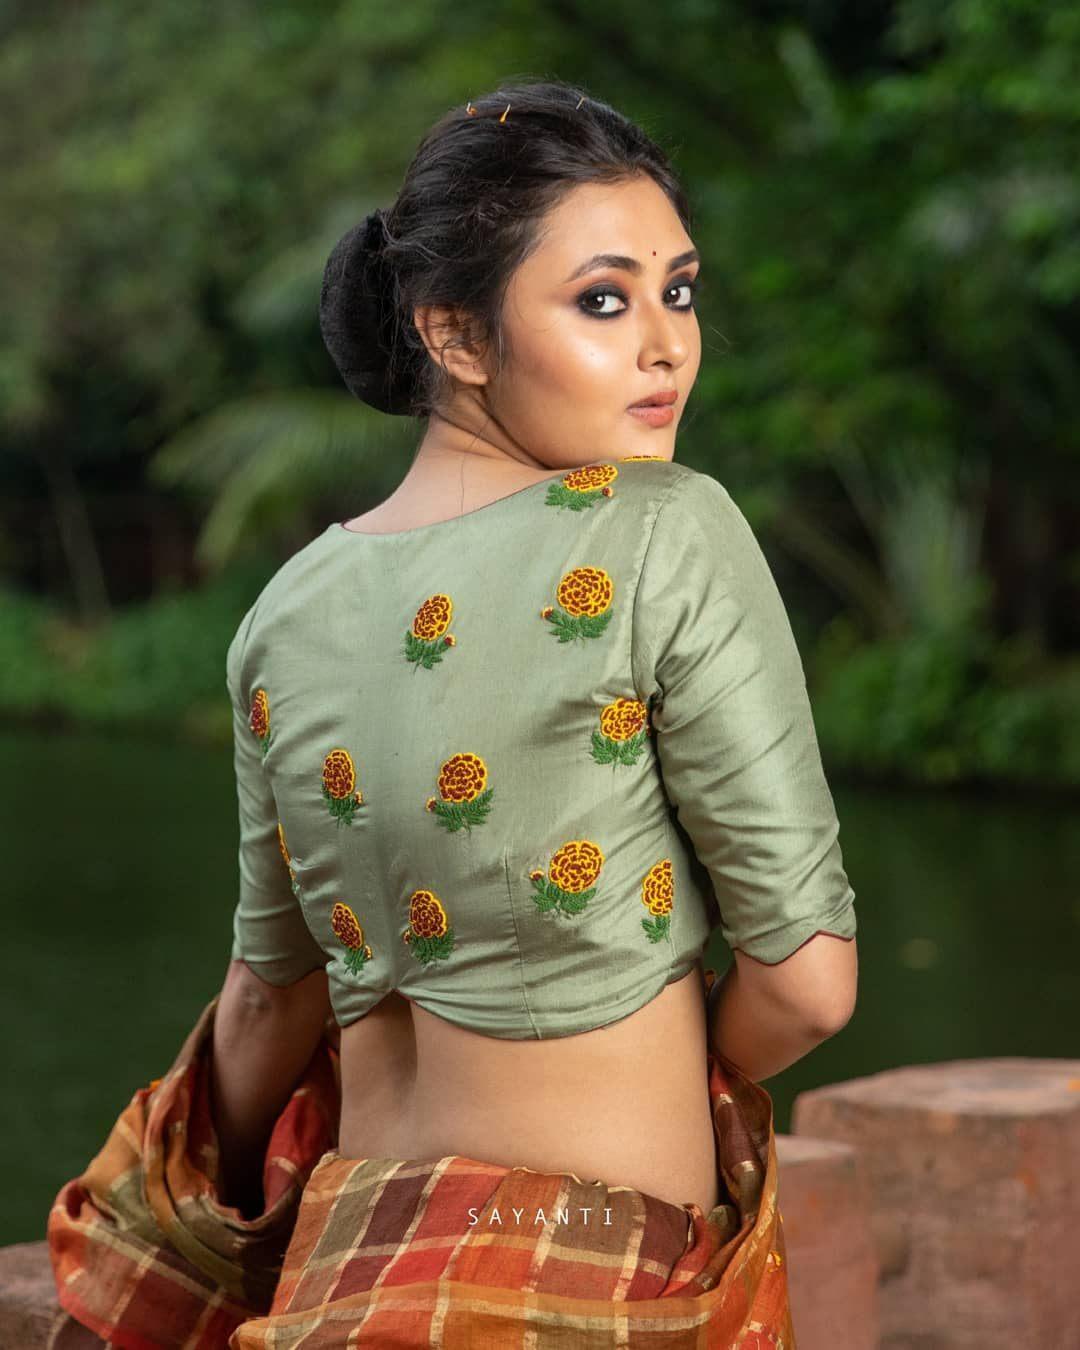 Mint marigold embroidery blouse-sayanti Ghosh